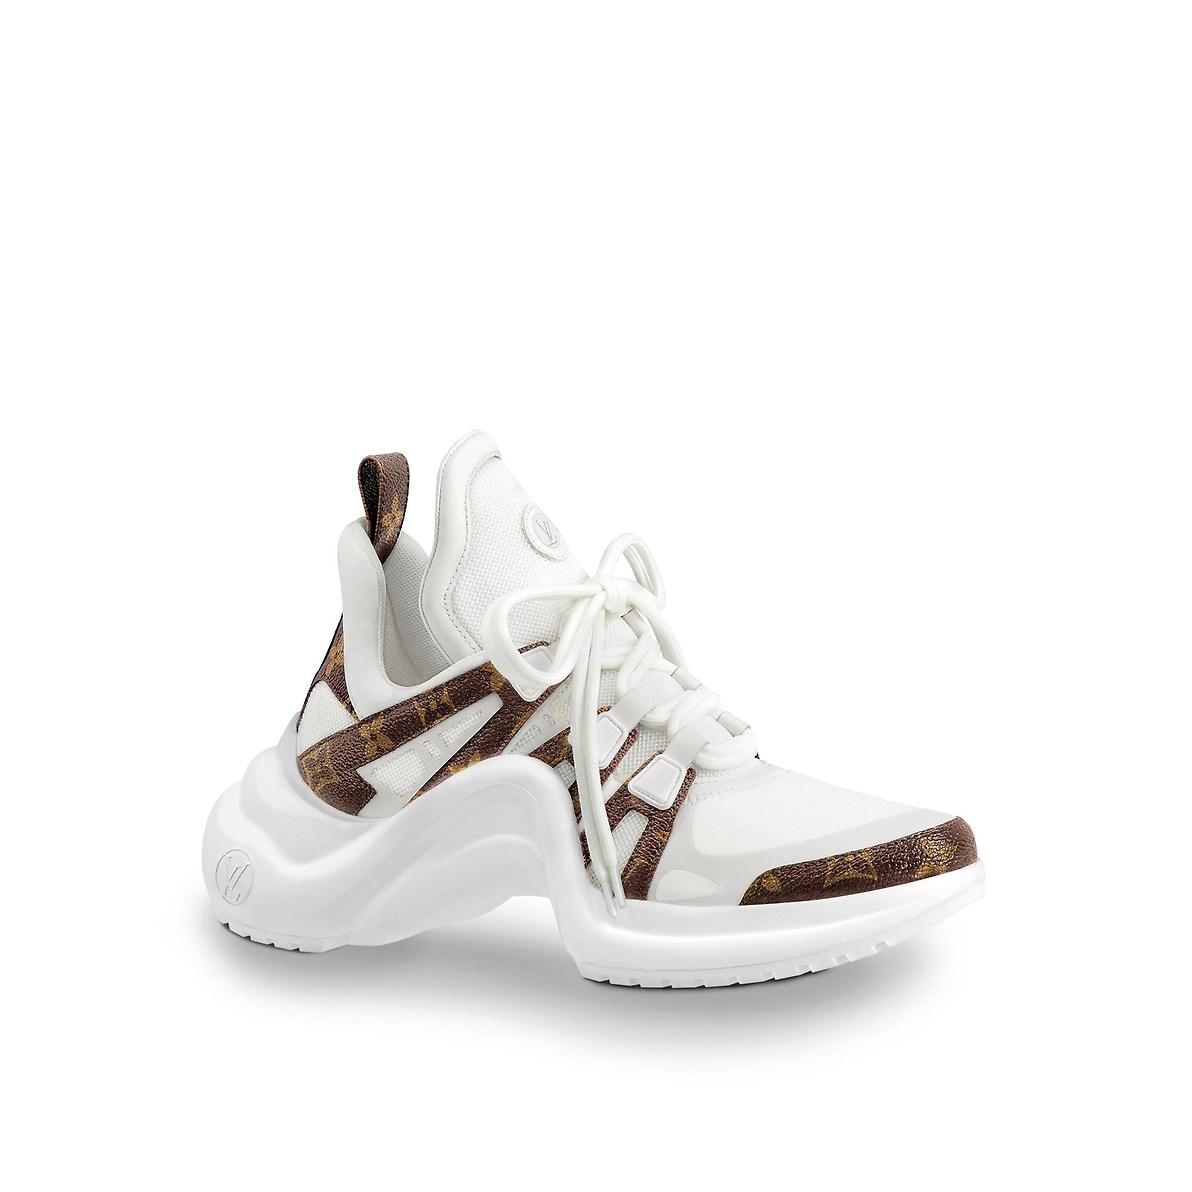 Chunky sneakers Louis Vuitton a 790 euro autunno inverno 2018 2019